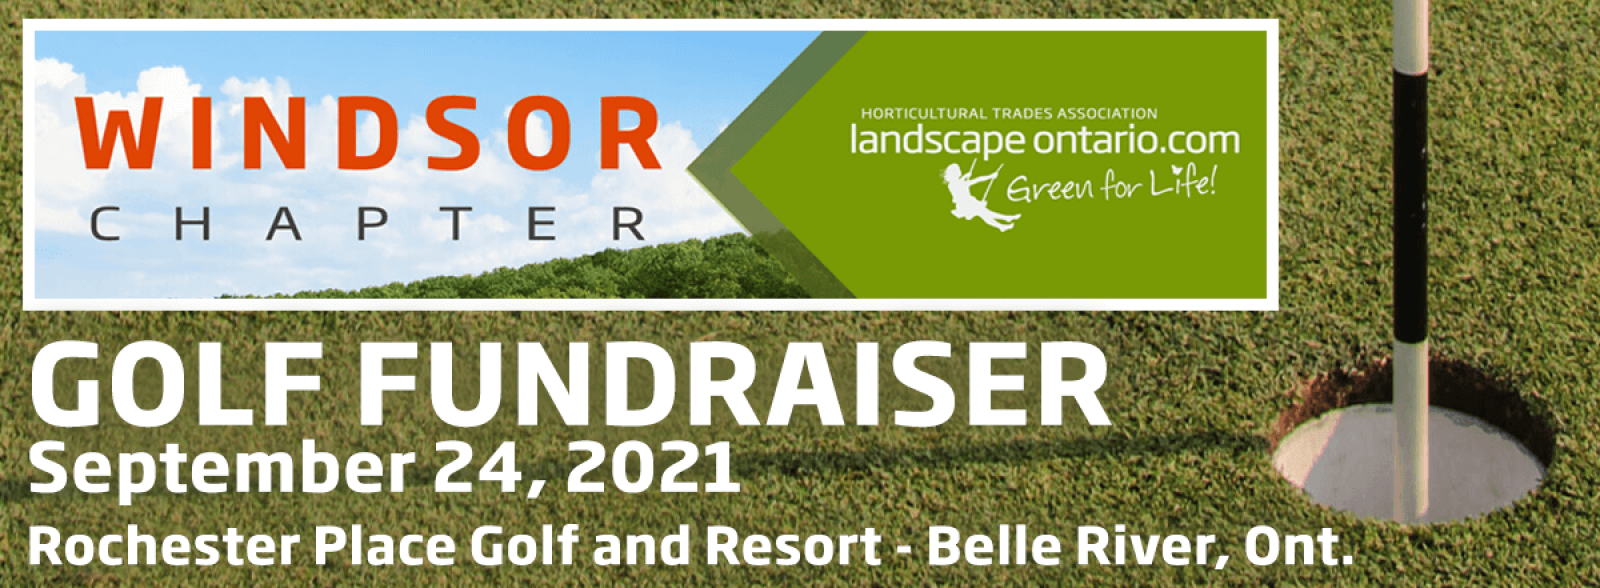 Windsor Chapter 2021 Golf Fundraiser